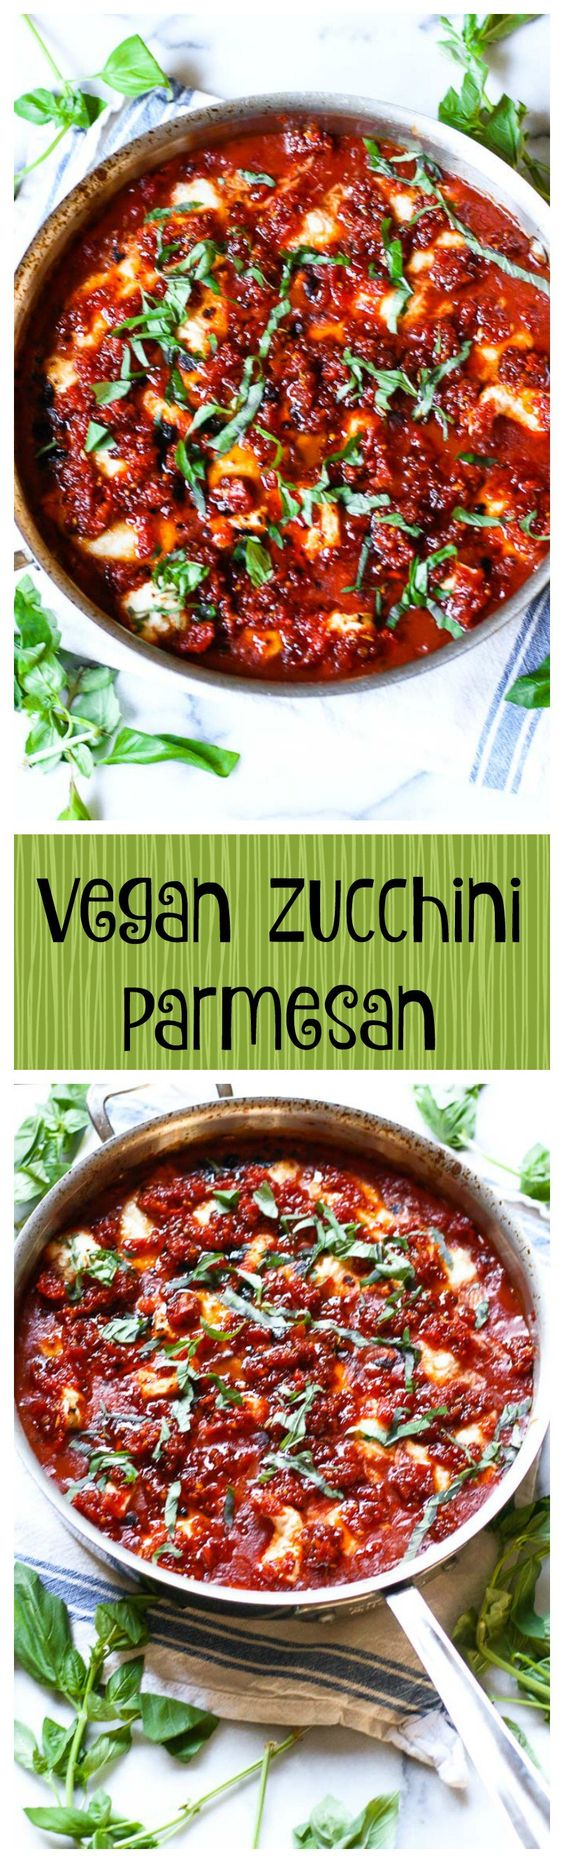 vegan skillet zucchini parmesan